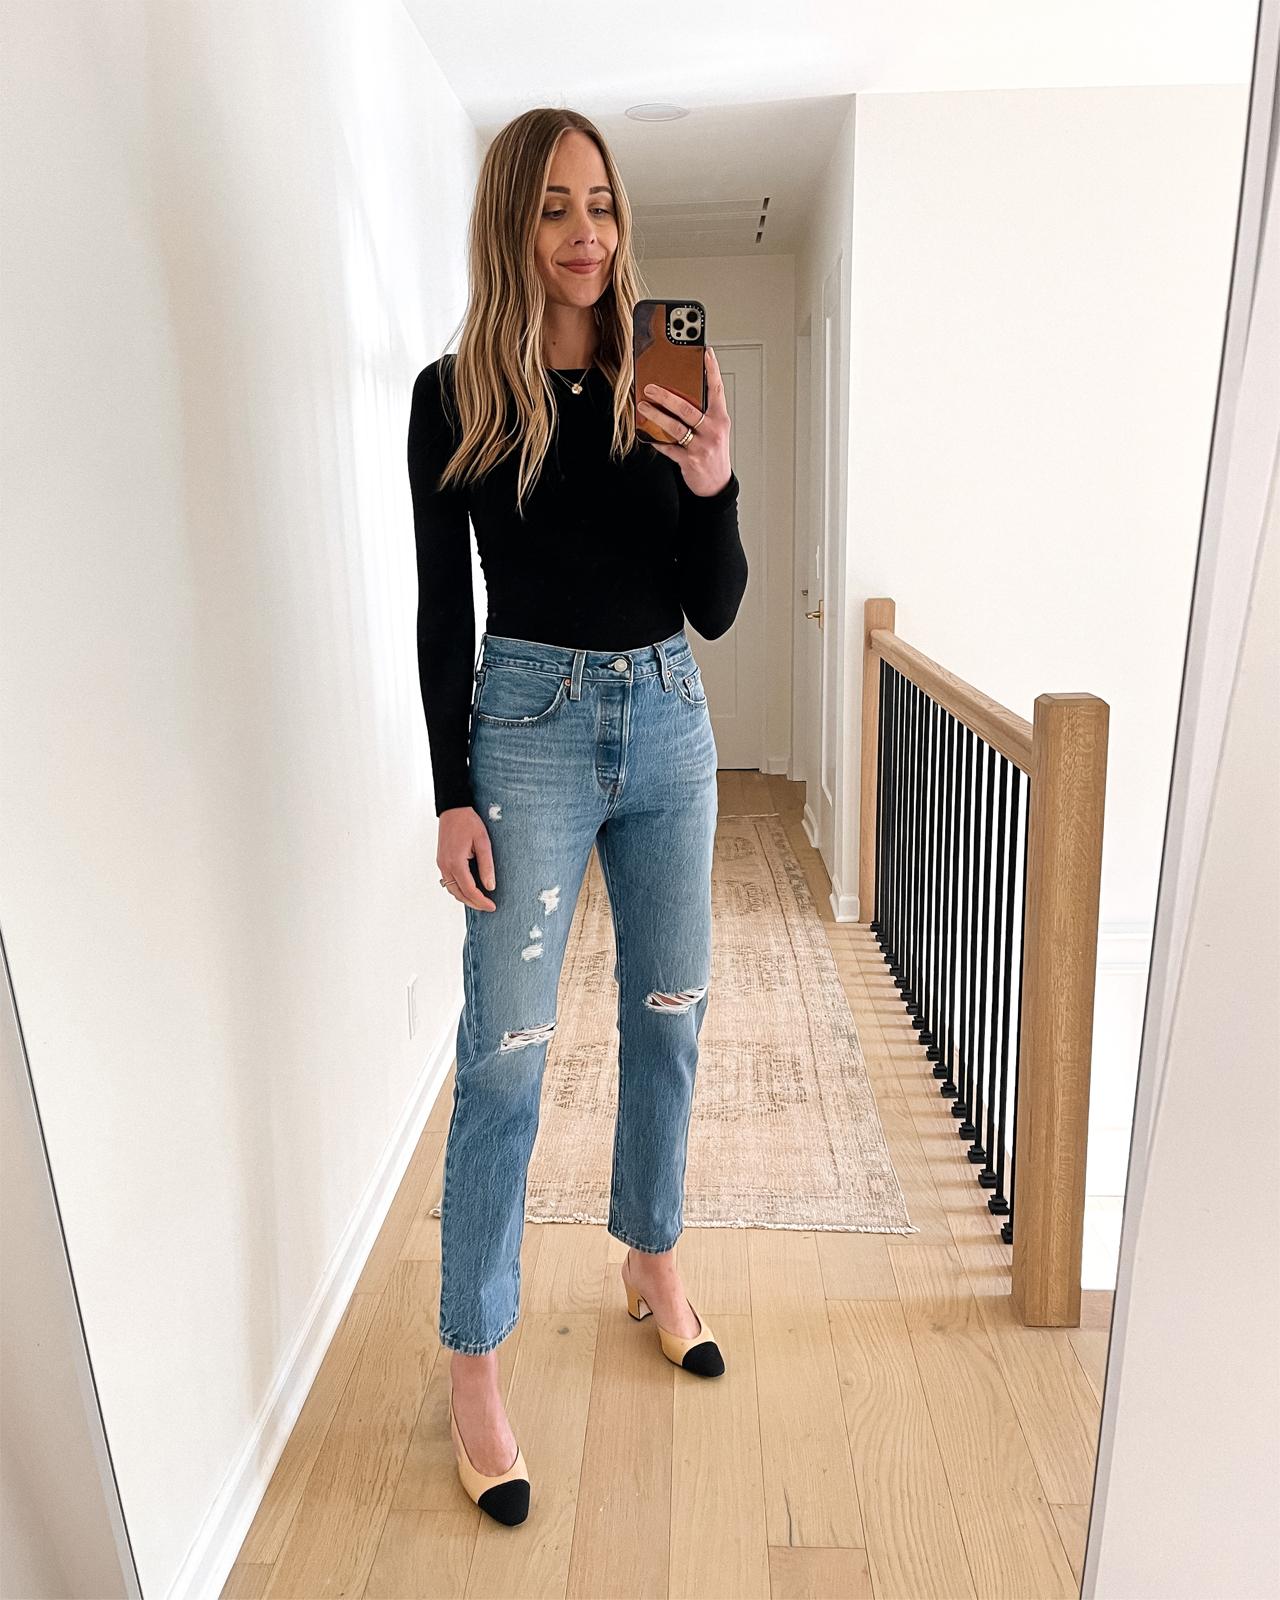 Fashion Jackson Wearing Levis 501 Original Fit Jeans Review Tango Light Black Bodysuit Chanel Slingbacks